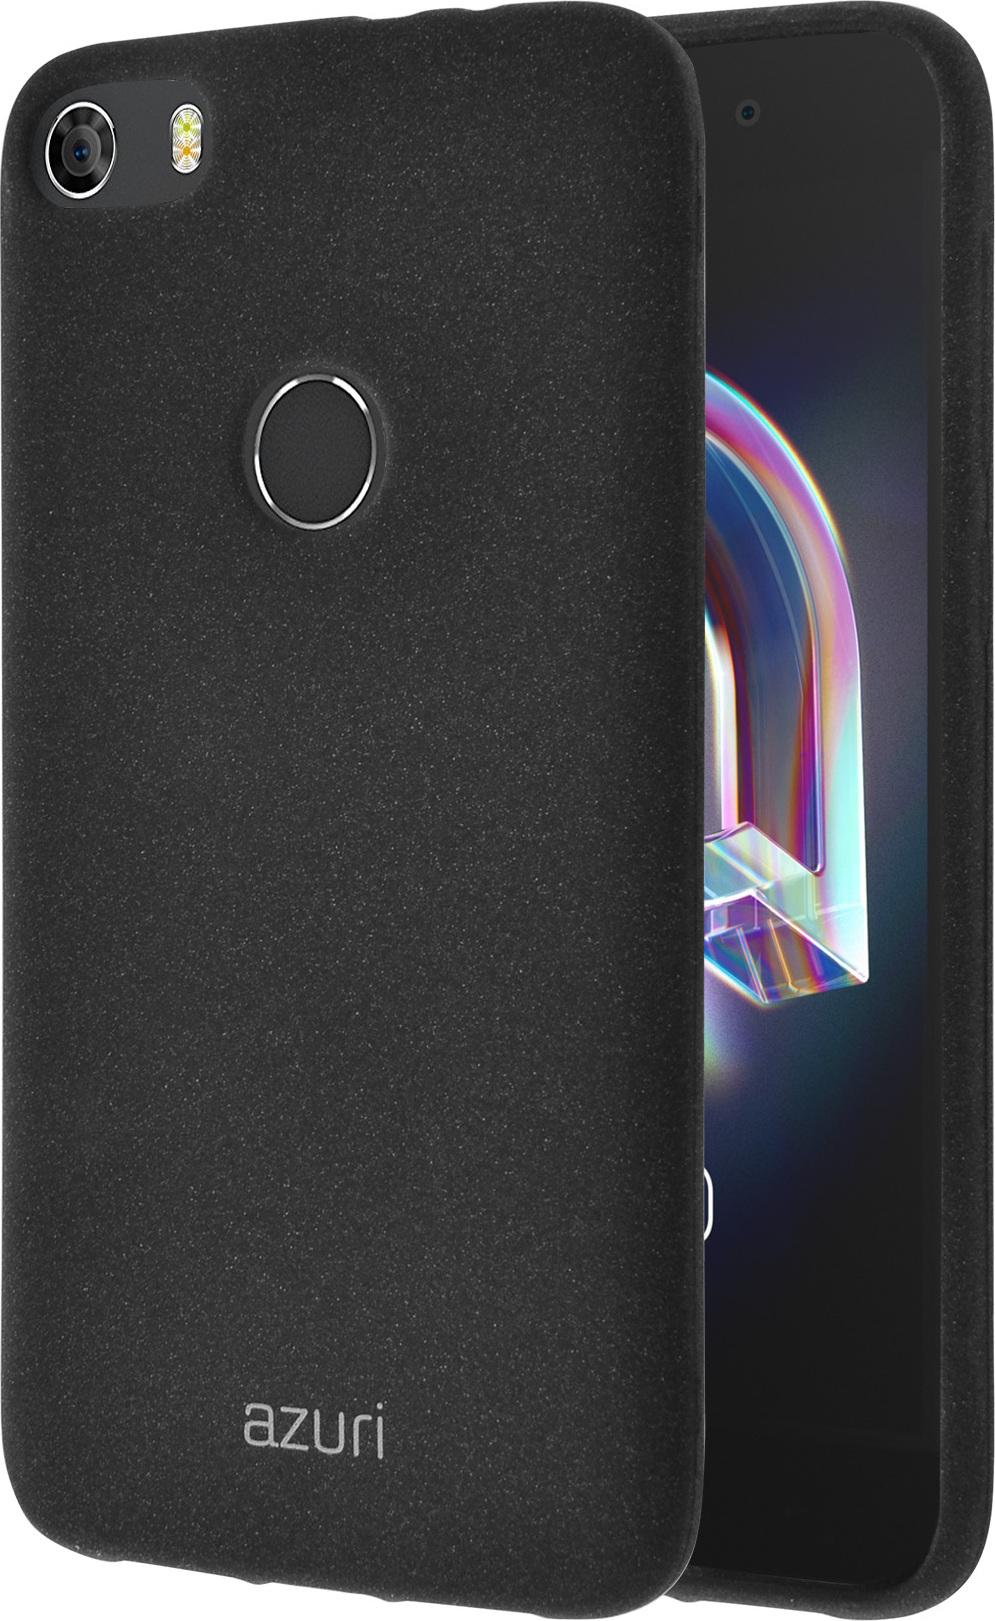 Azuri flexible cover with sand texture - black - Alcatel Idol 5